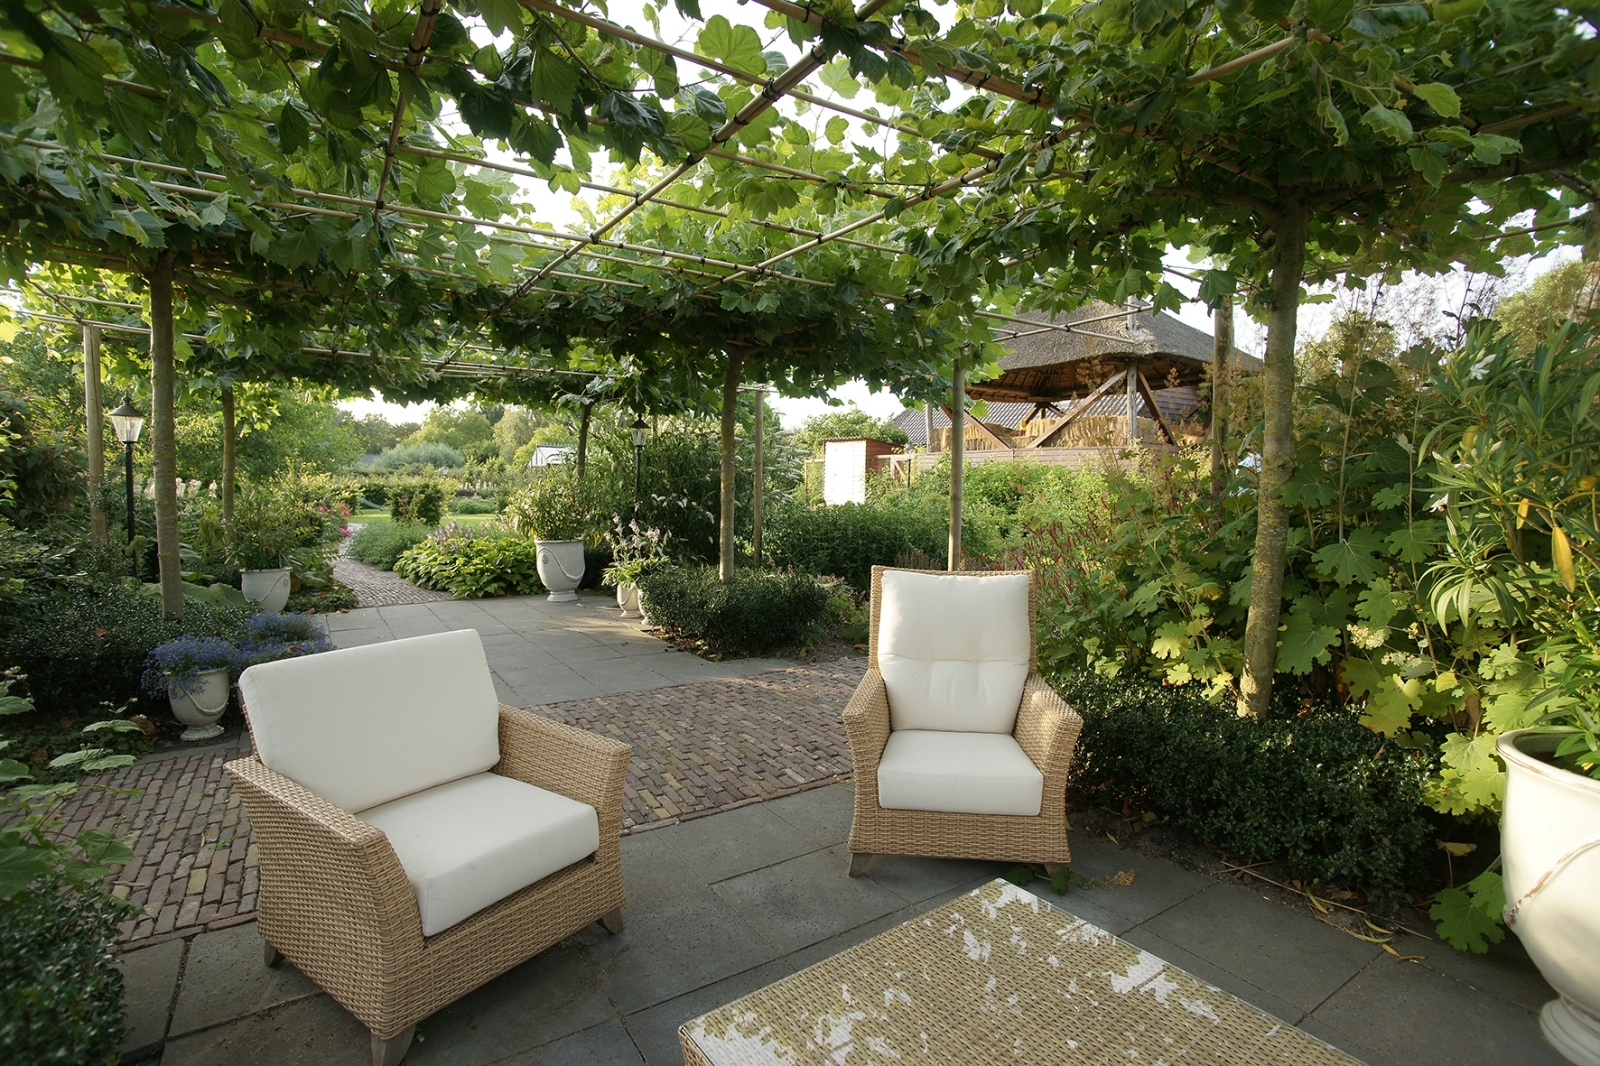 Particuliere tuinen hoveniersbedrijf jonkers for Tuinarchitect kleine tuin